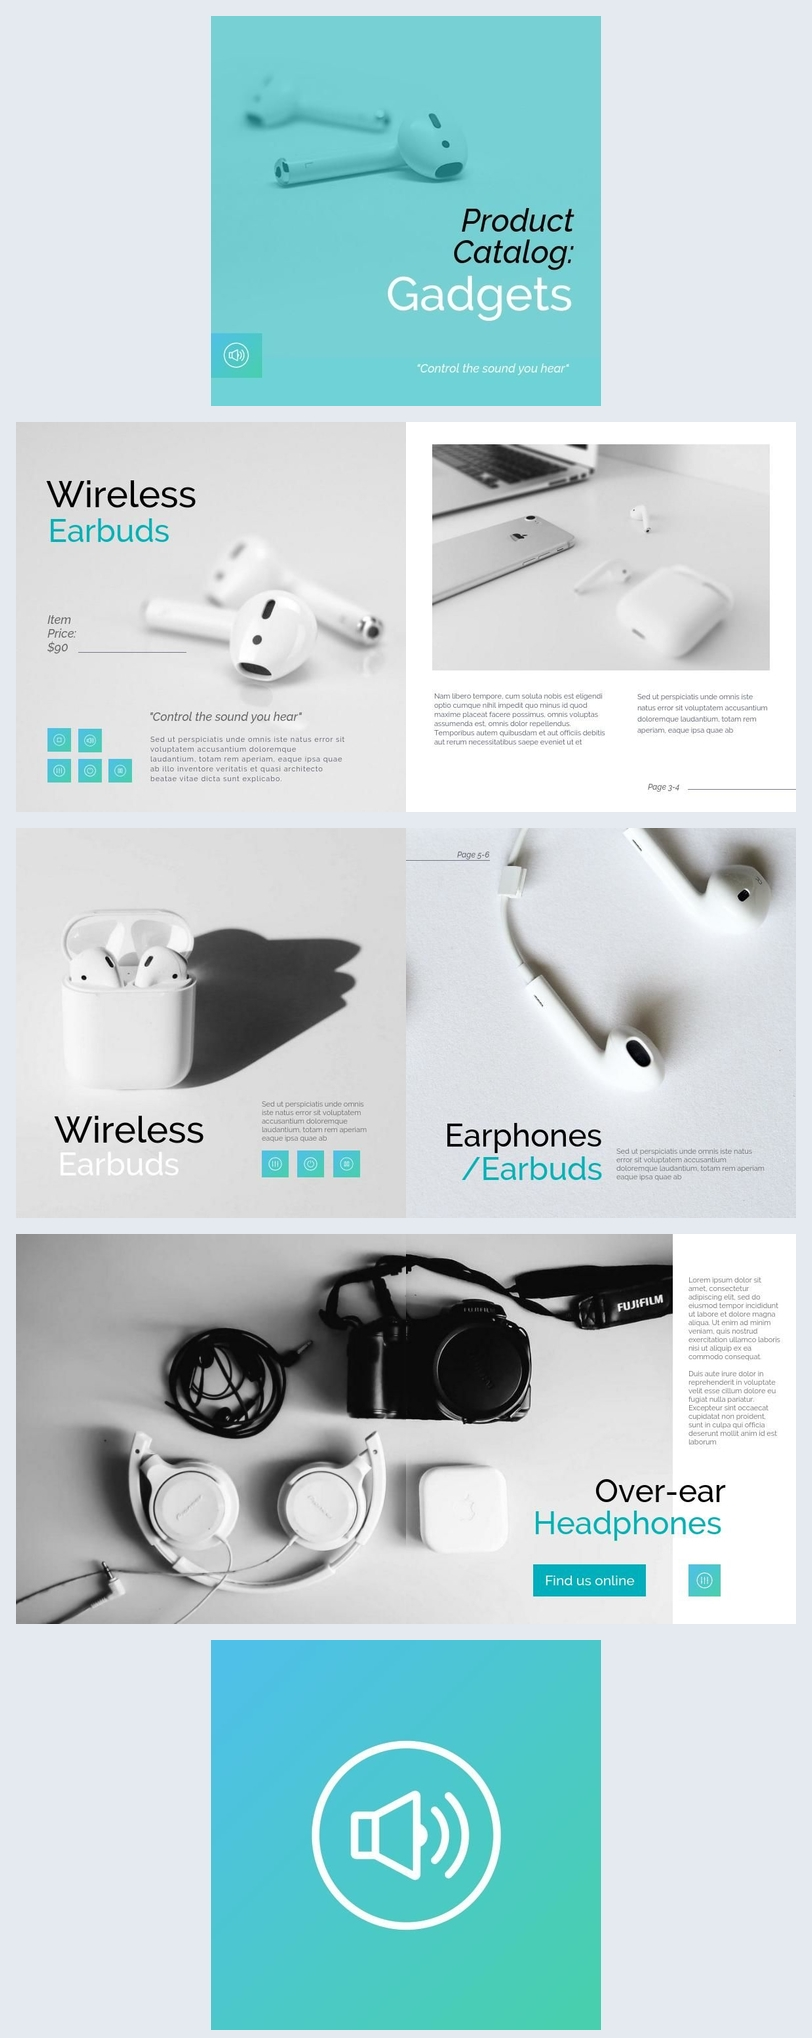 Electronics & Tech Gadgets Catalog Design